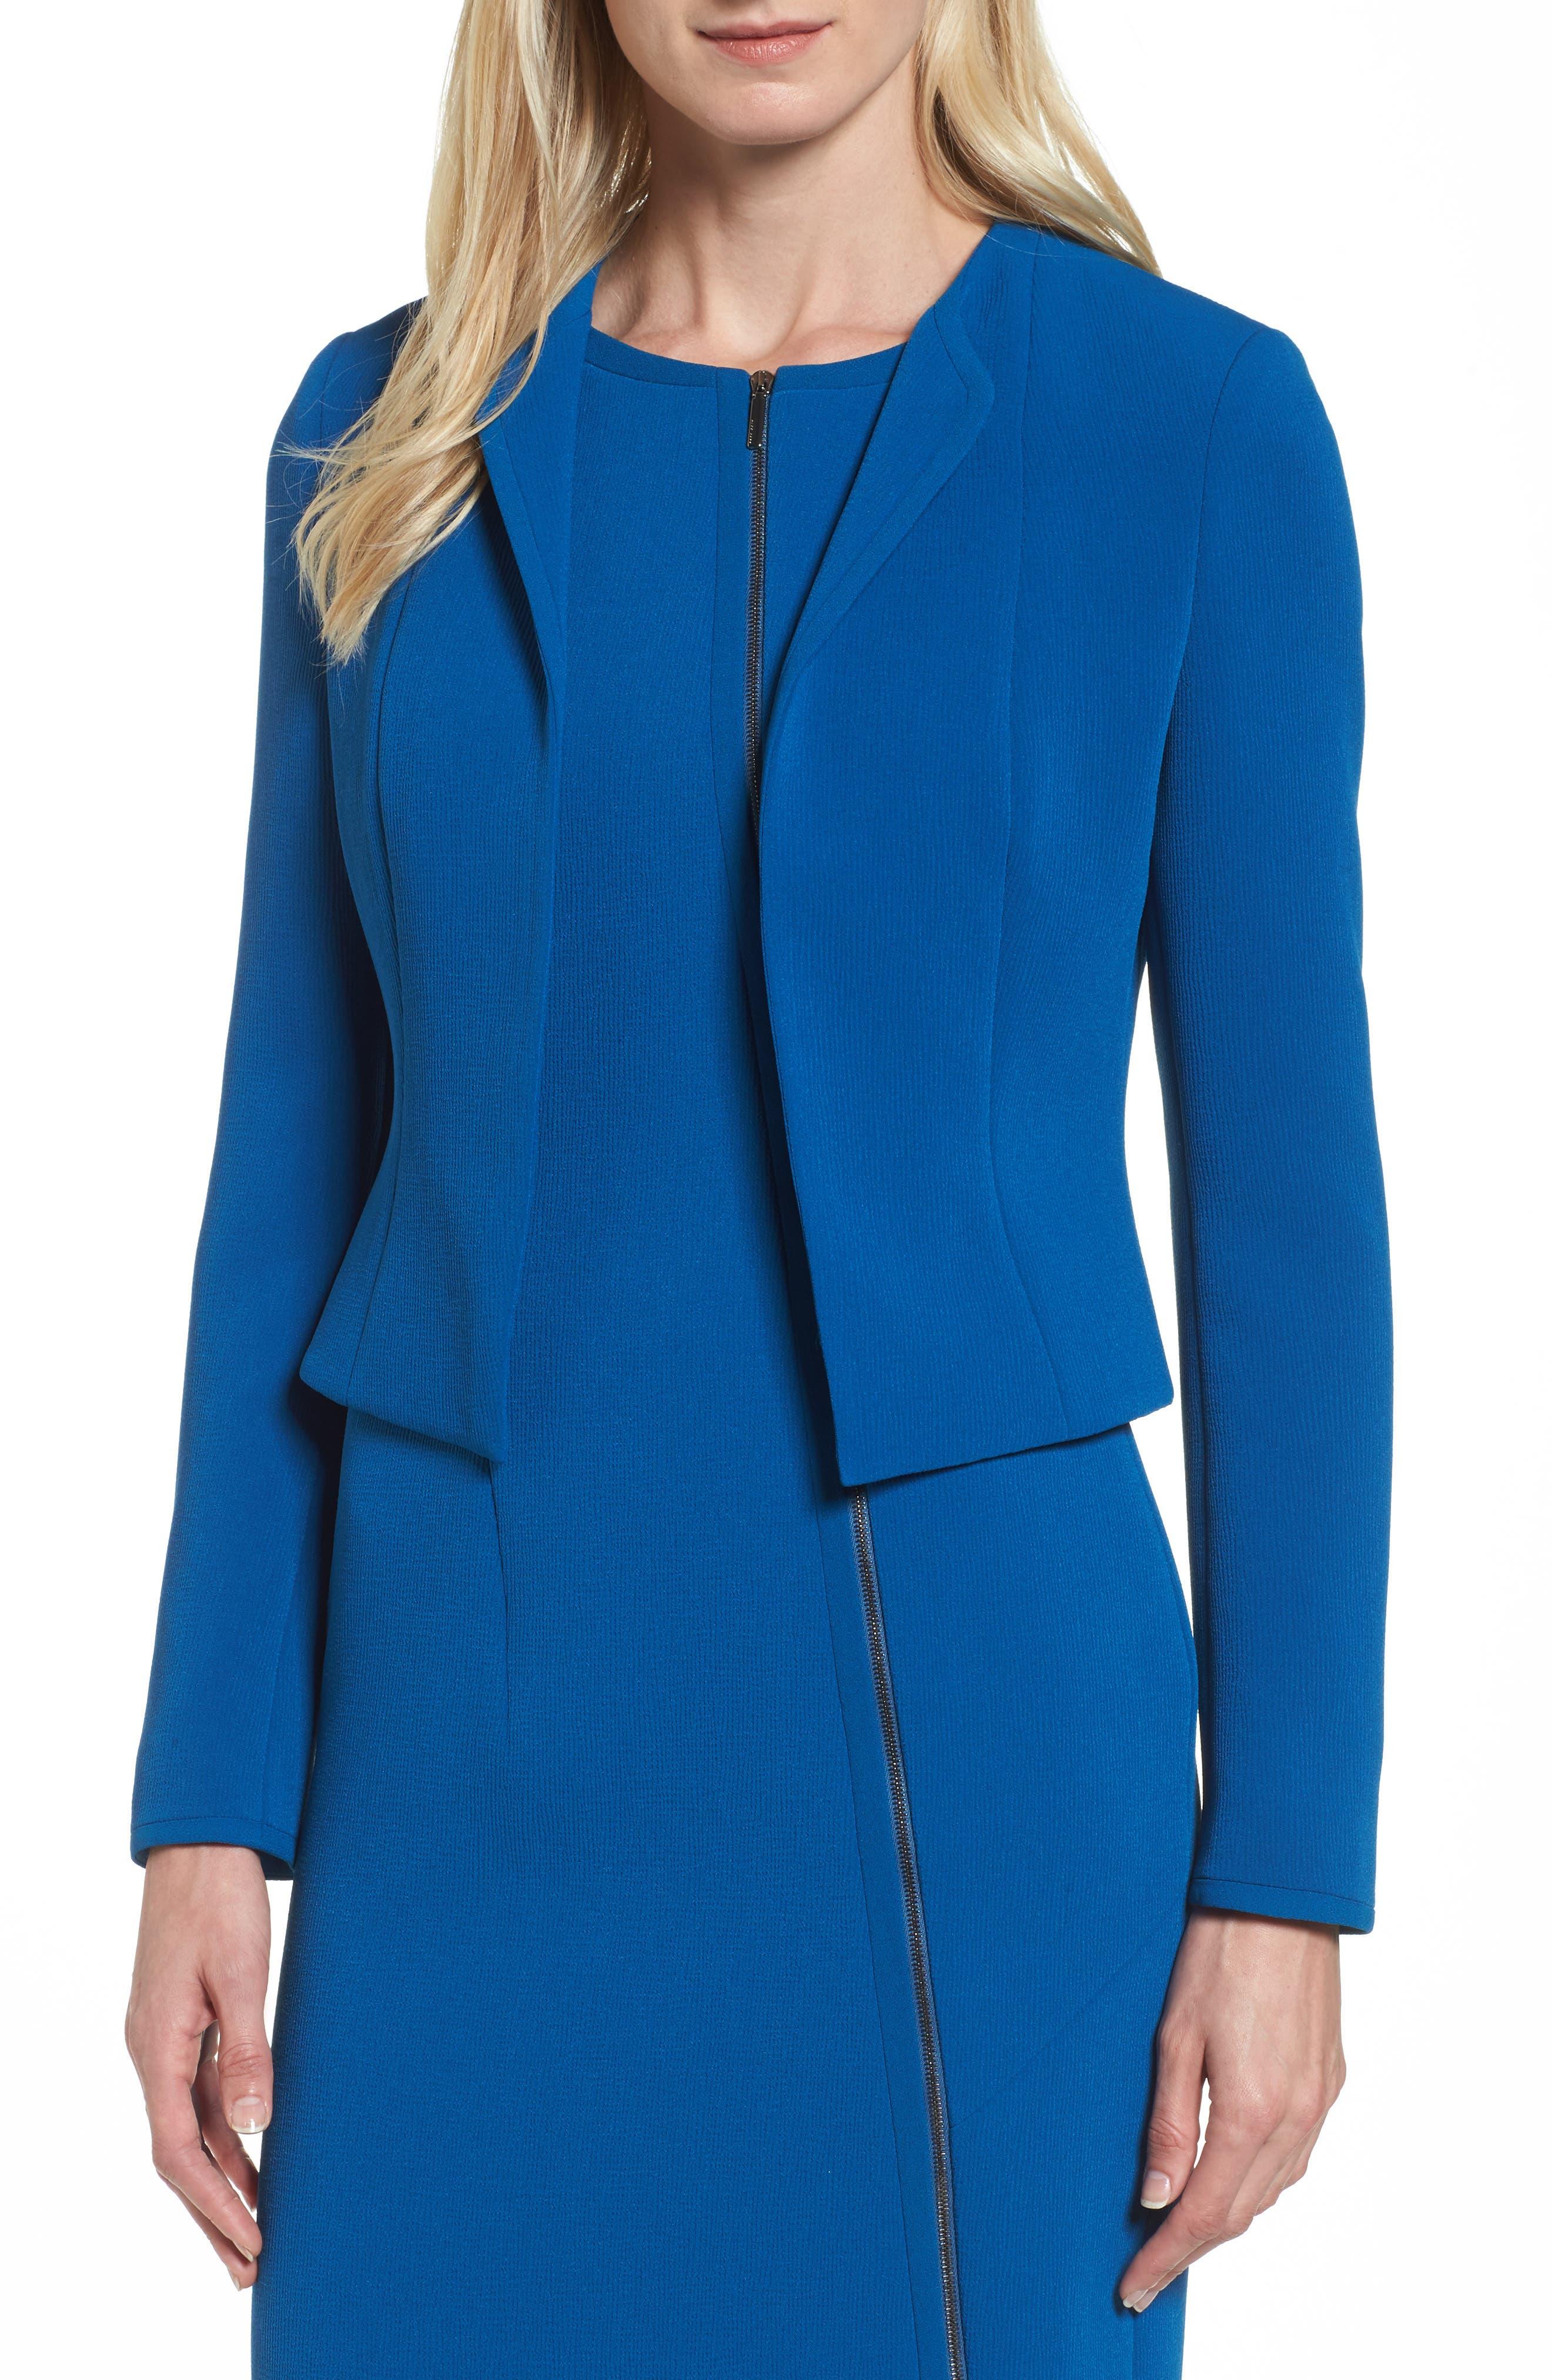 Main Image - BOSS Jerusa Crop Suit Jacket (Petite) (Nordstrom Exclusive)